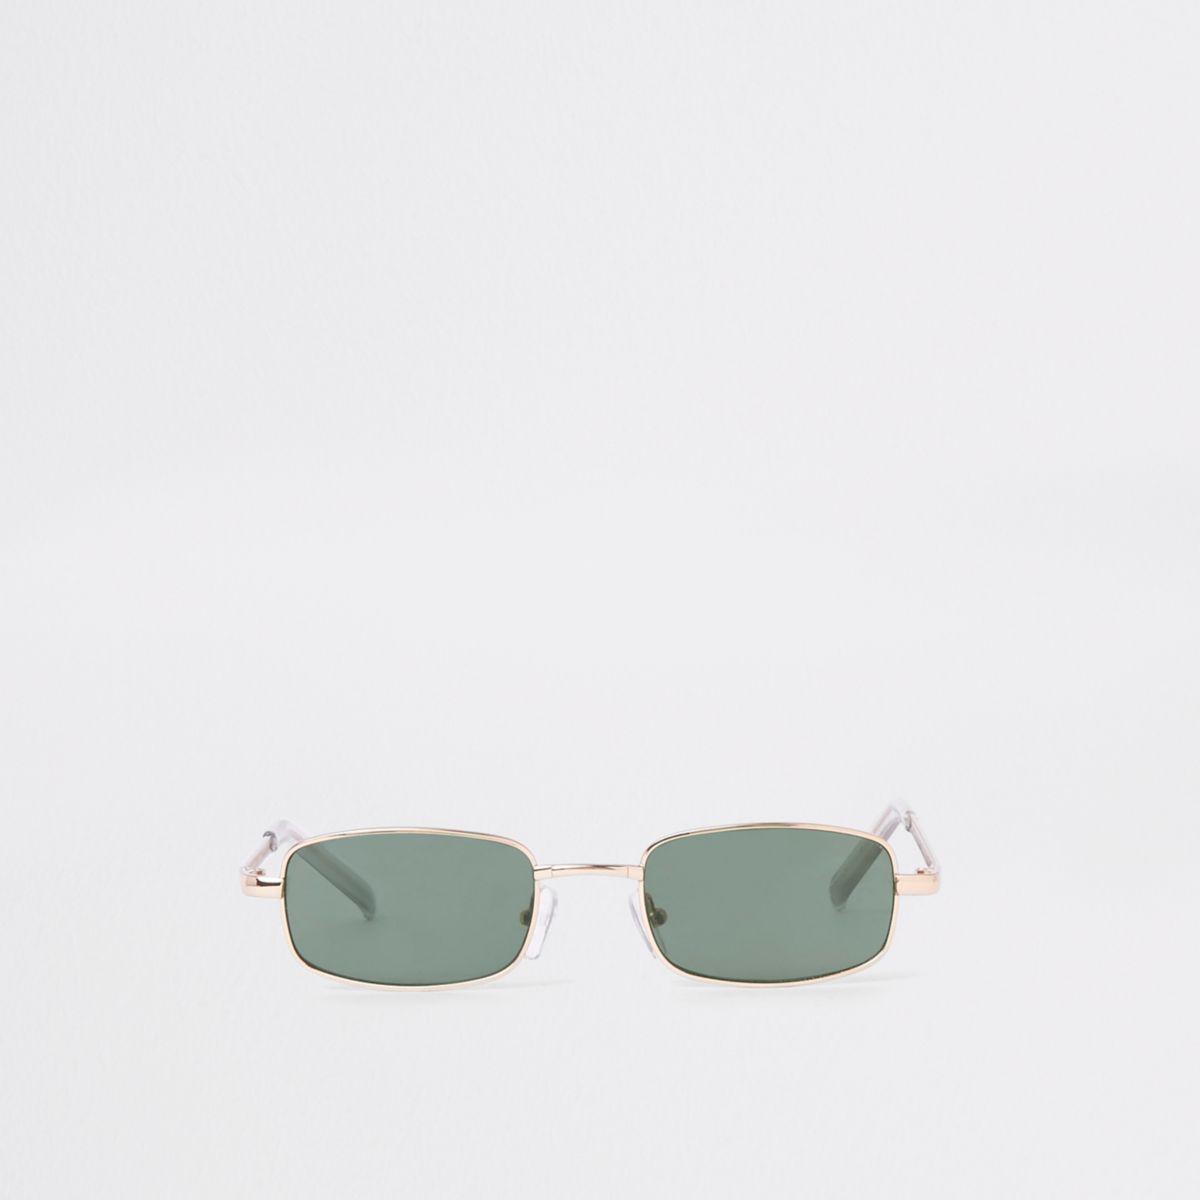 Gold tone narrow lens sunglasses